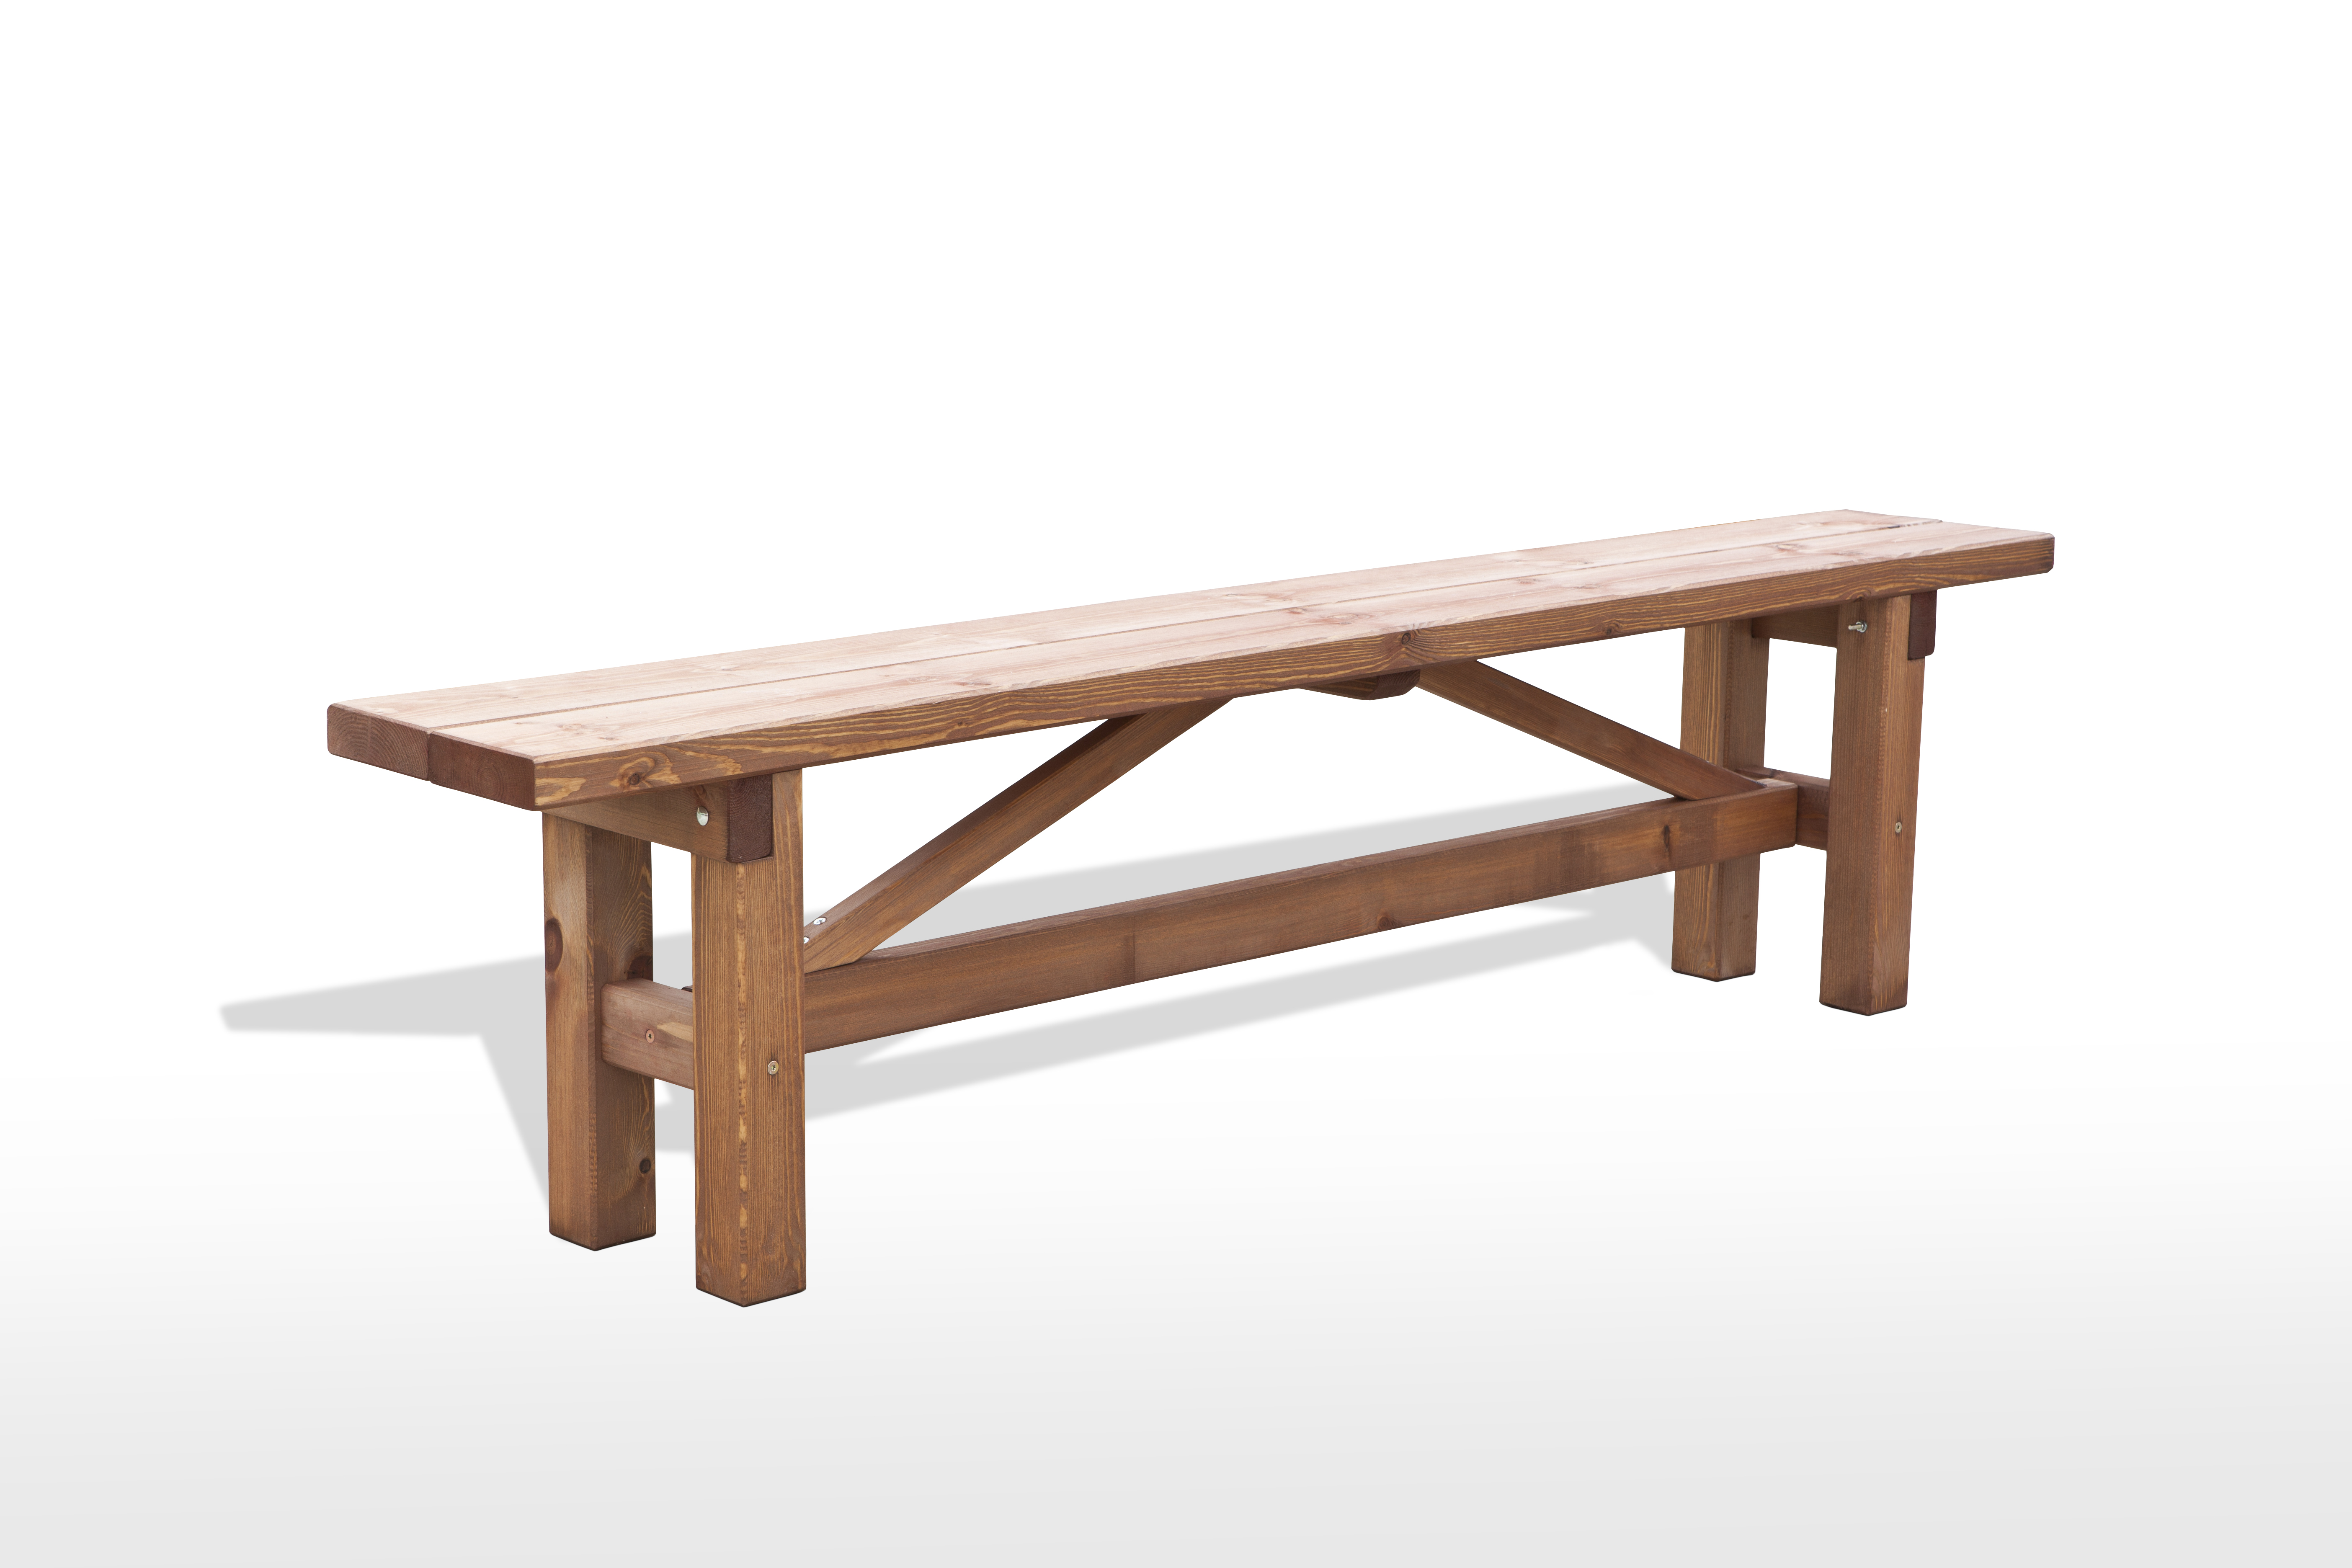 Banco de madera para jard n muebles de casa jard n terraza - Banco madera jardin ...